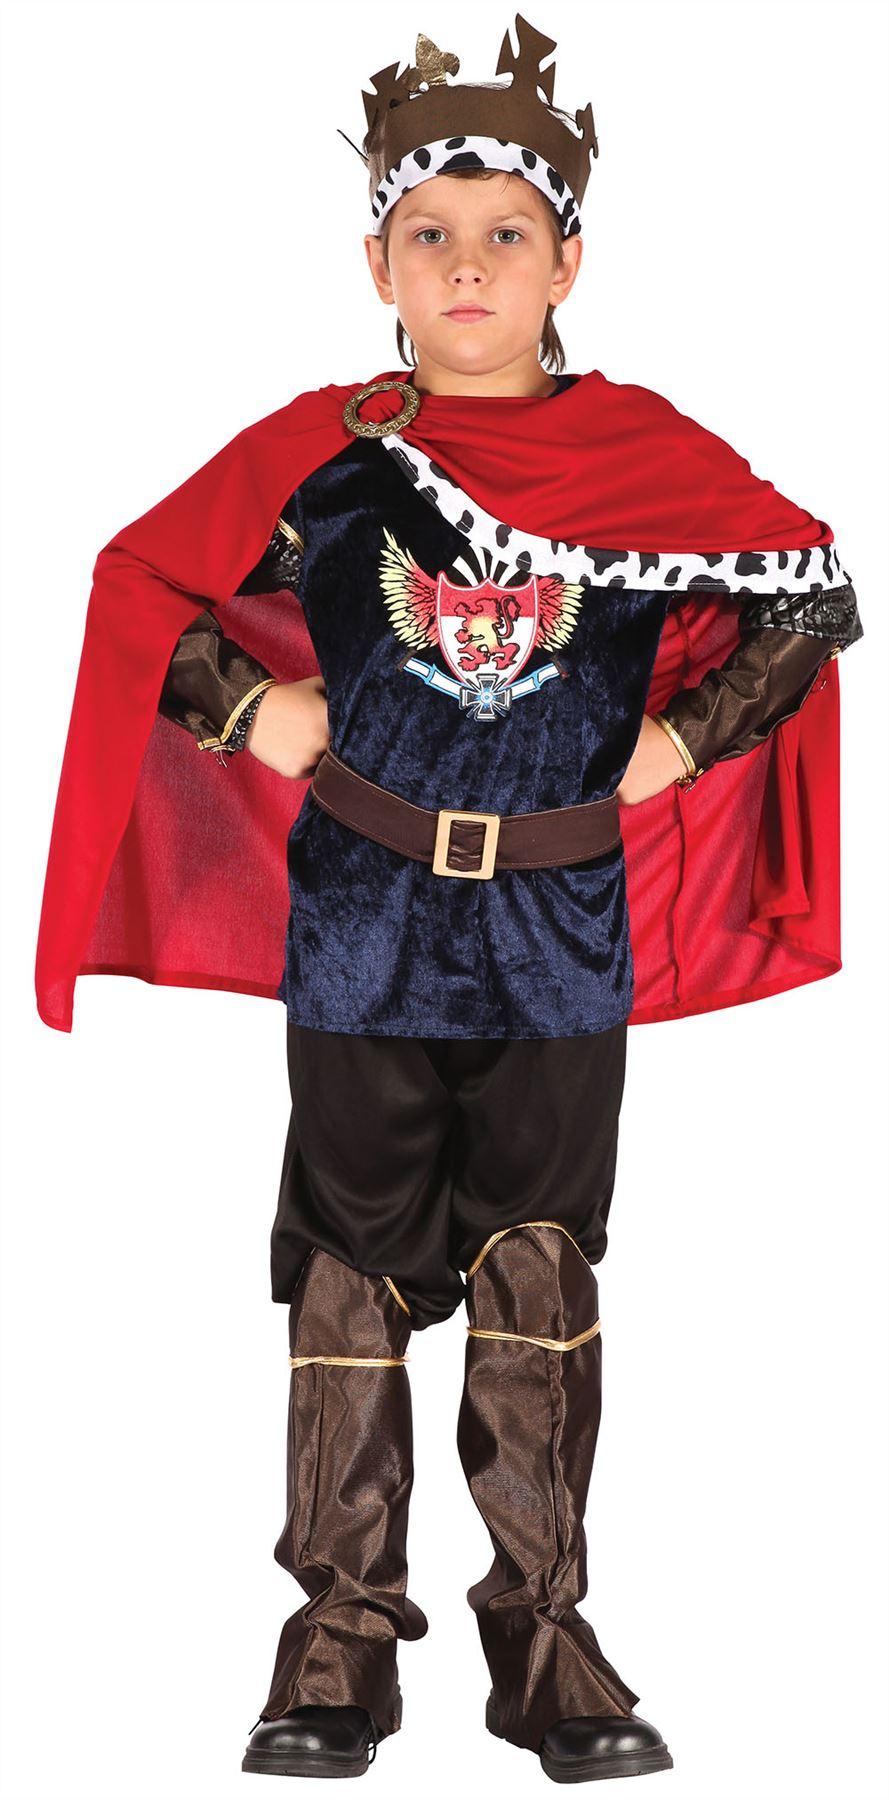 Garçons beau prince // CHEVALIER Fantasy Roi Costume Robe Fantaisie pour Enfants